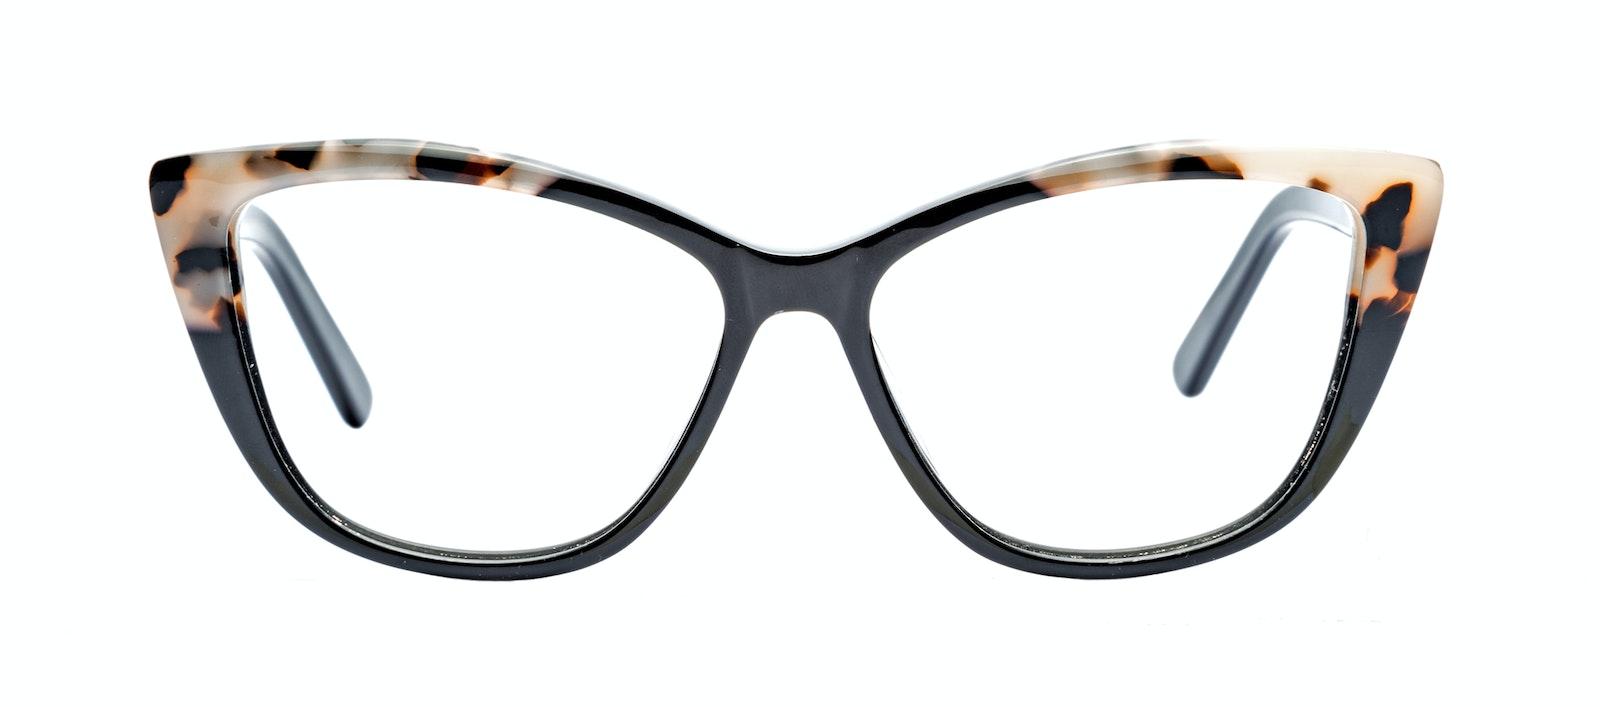 db3e278e514f Affordable Fashion Glasses Cat Eye Daring Cateye Eyeglasses Women Dolled Up Ebony  Granite Front